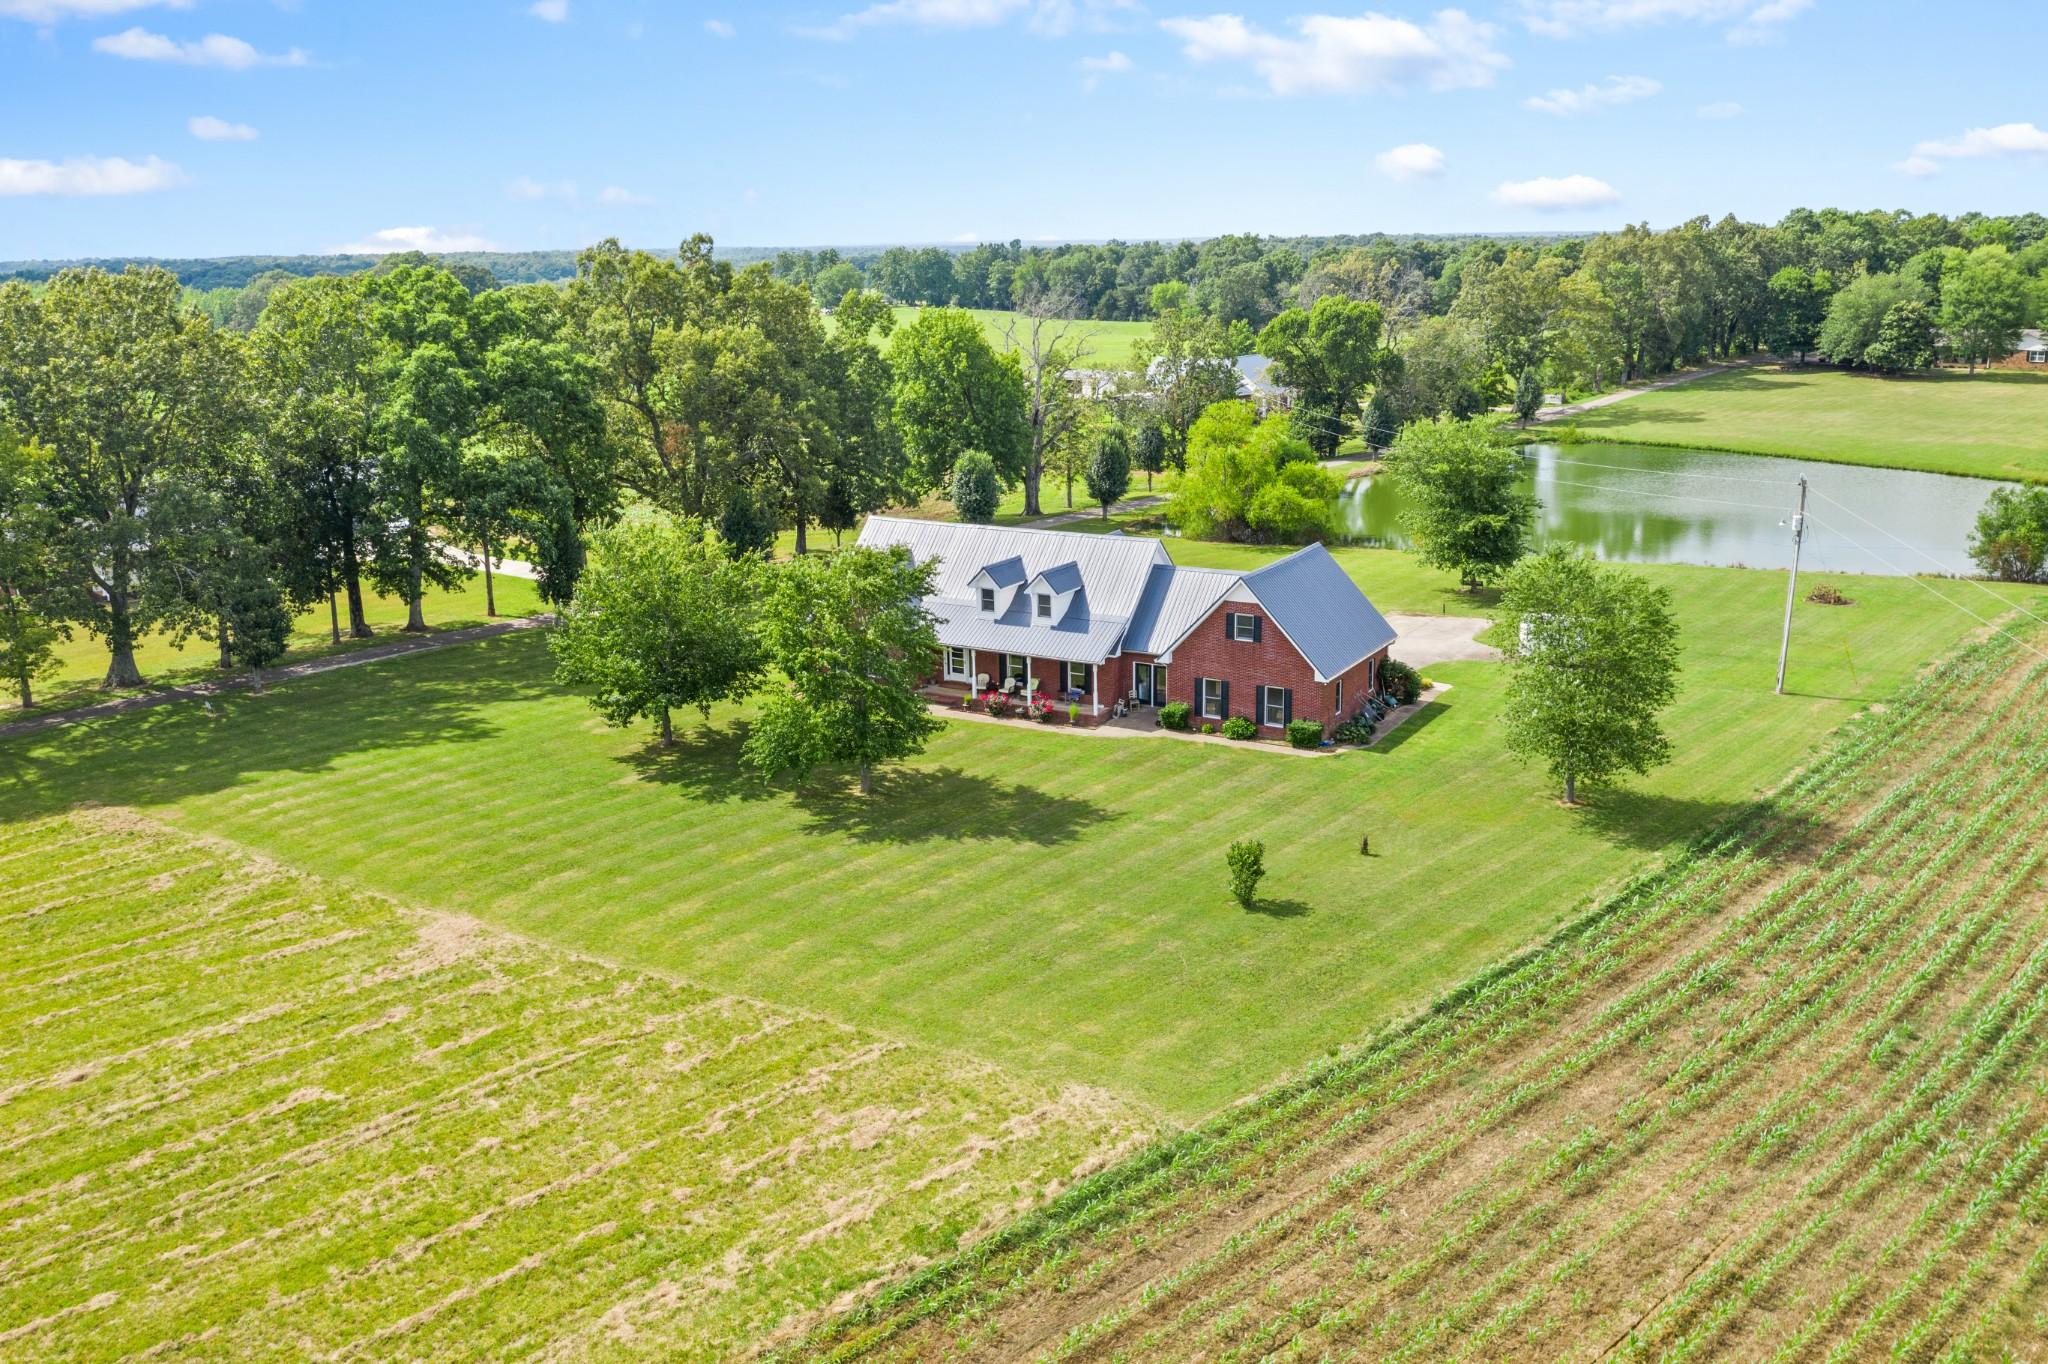 3018 Old Nashville Highway 3018 Property Photo - MC EWEN, TN real estate listing